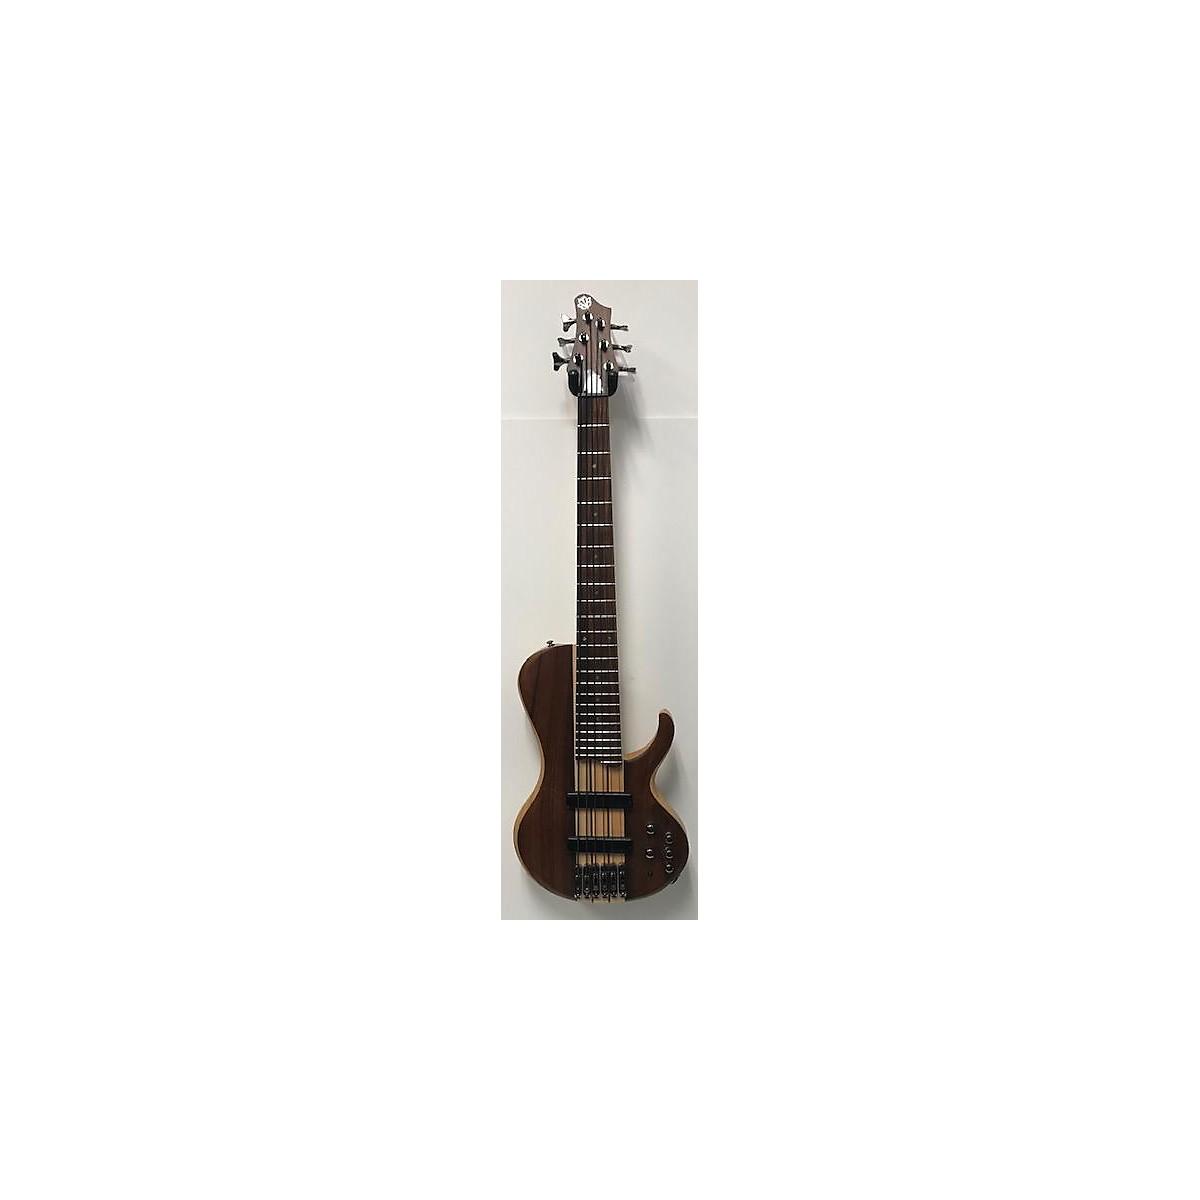 Ibanez BTB686SC Electric Bass Guitar